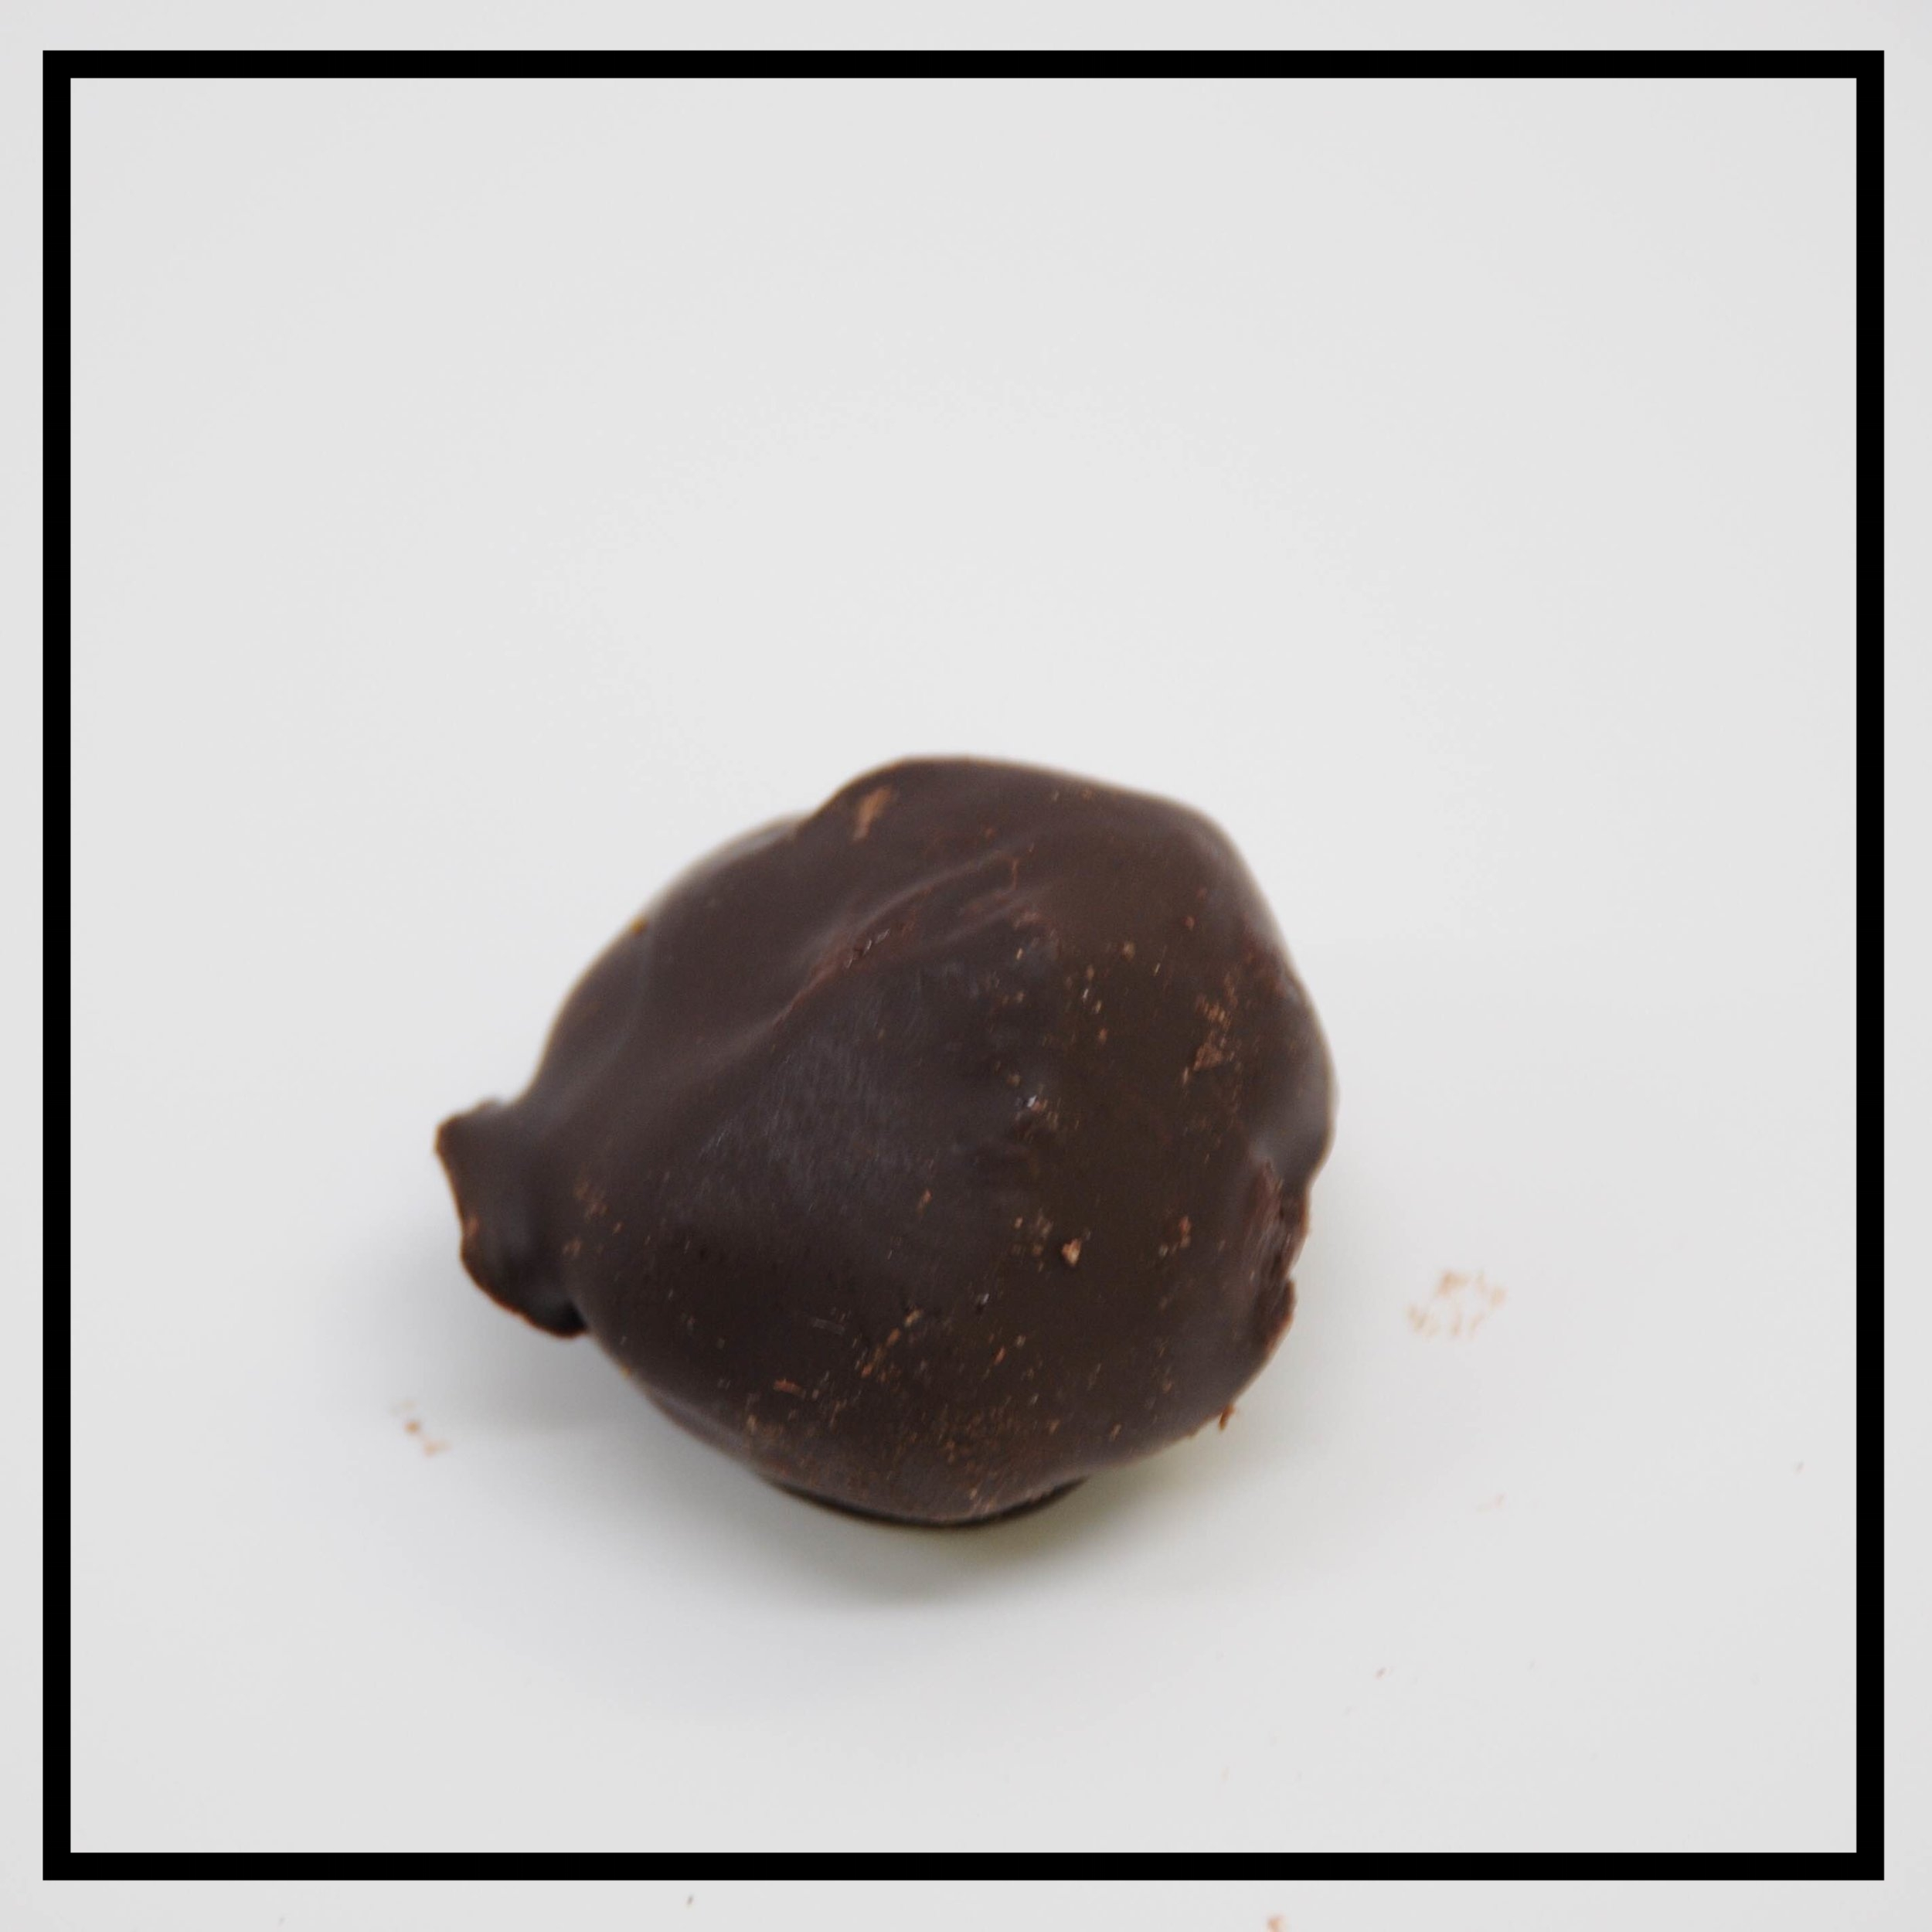 DARK CHOCOLATE   Dark chocolate ganache dipped in dark chocolate, dusted with cocoa